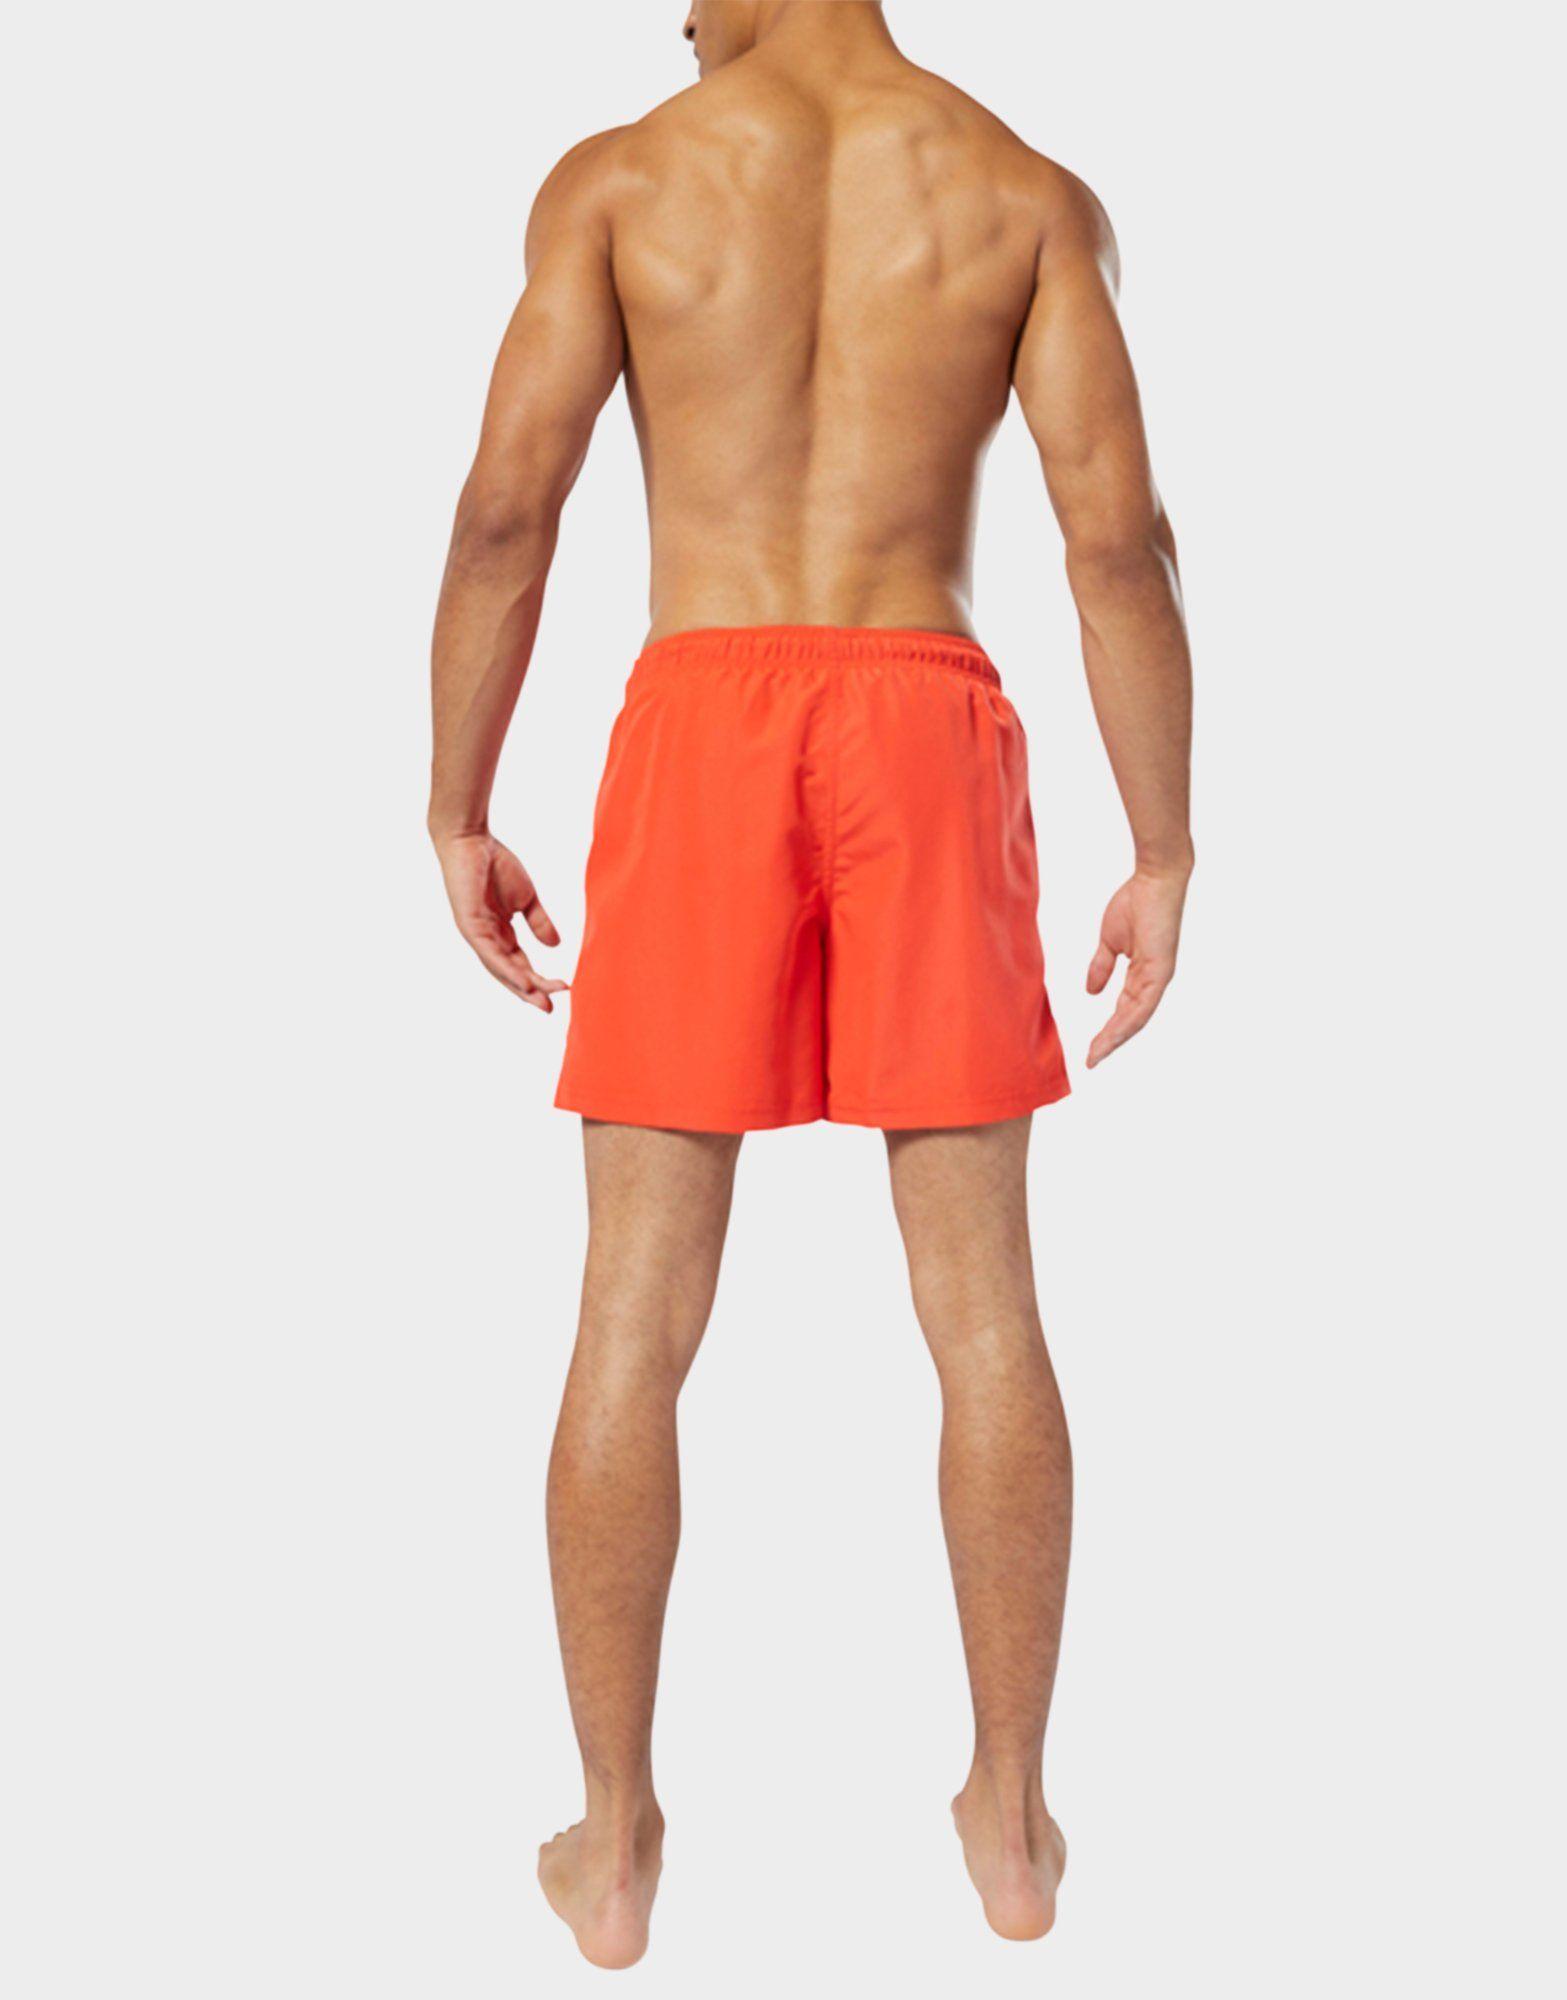 REEBOK Swim Boxers